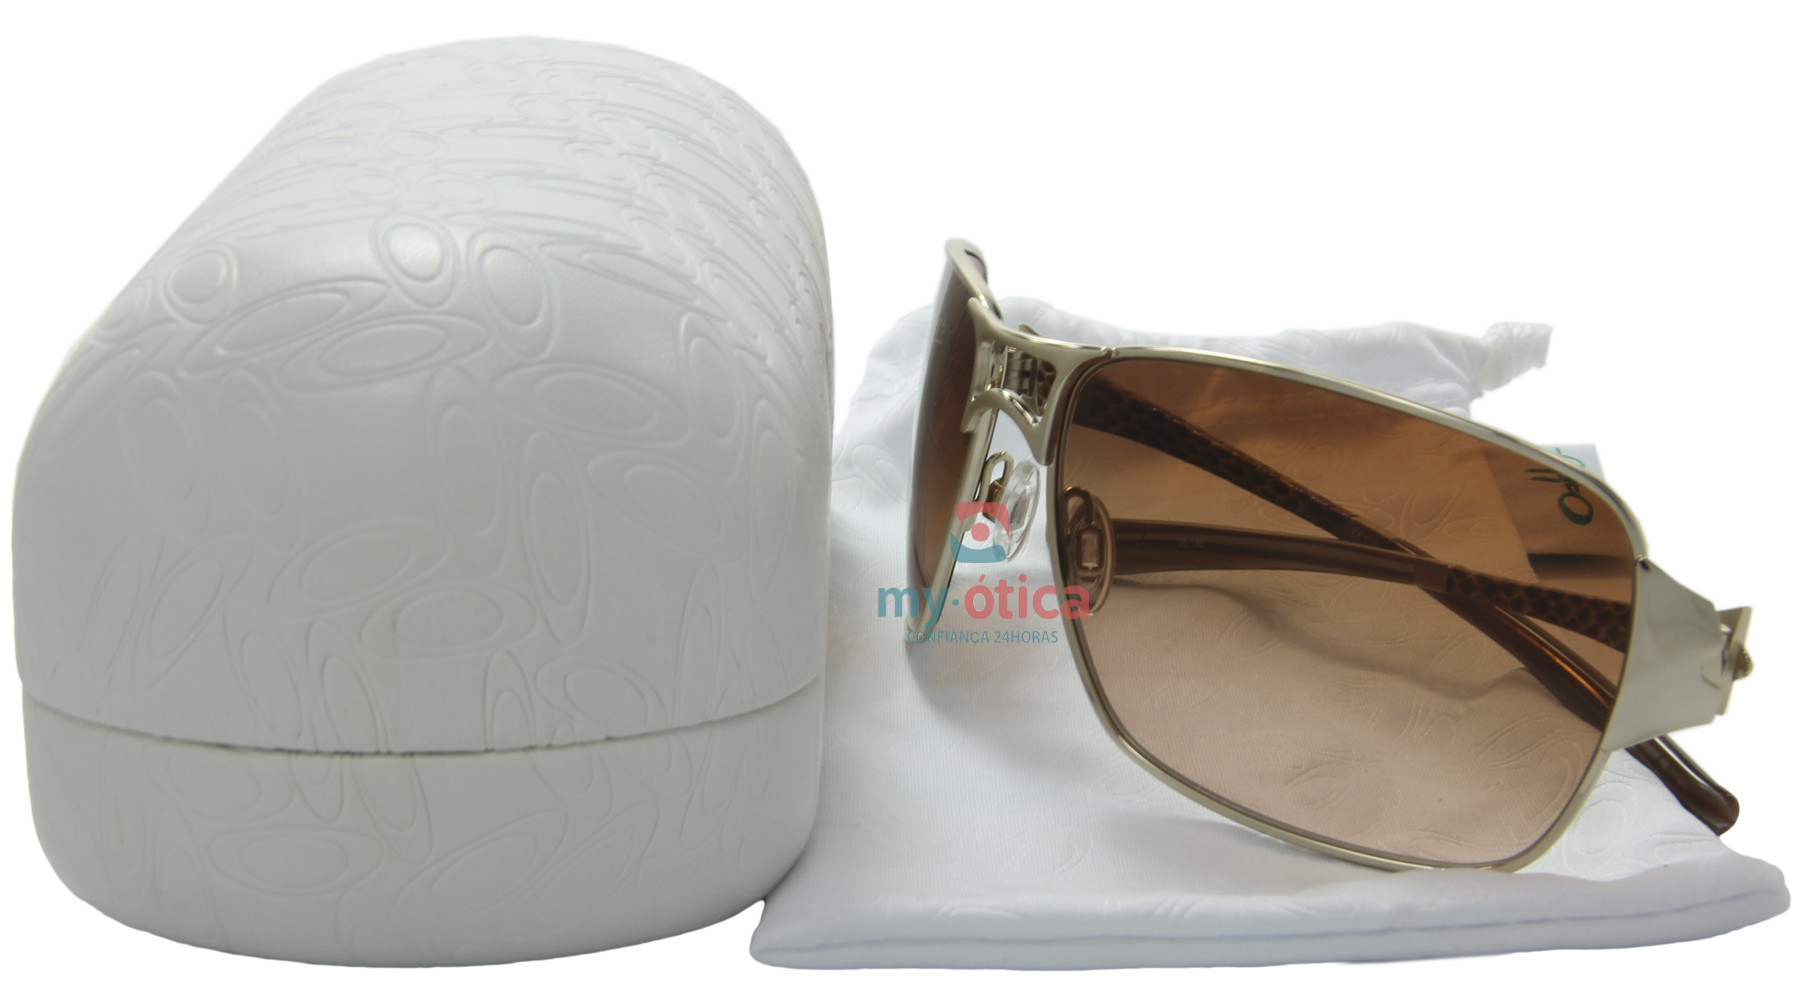 9a5e797cb4a28 Óculos de Sol Oakley Impatient - Dourado e Marrom - Óculos - Oakley ...